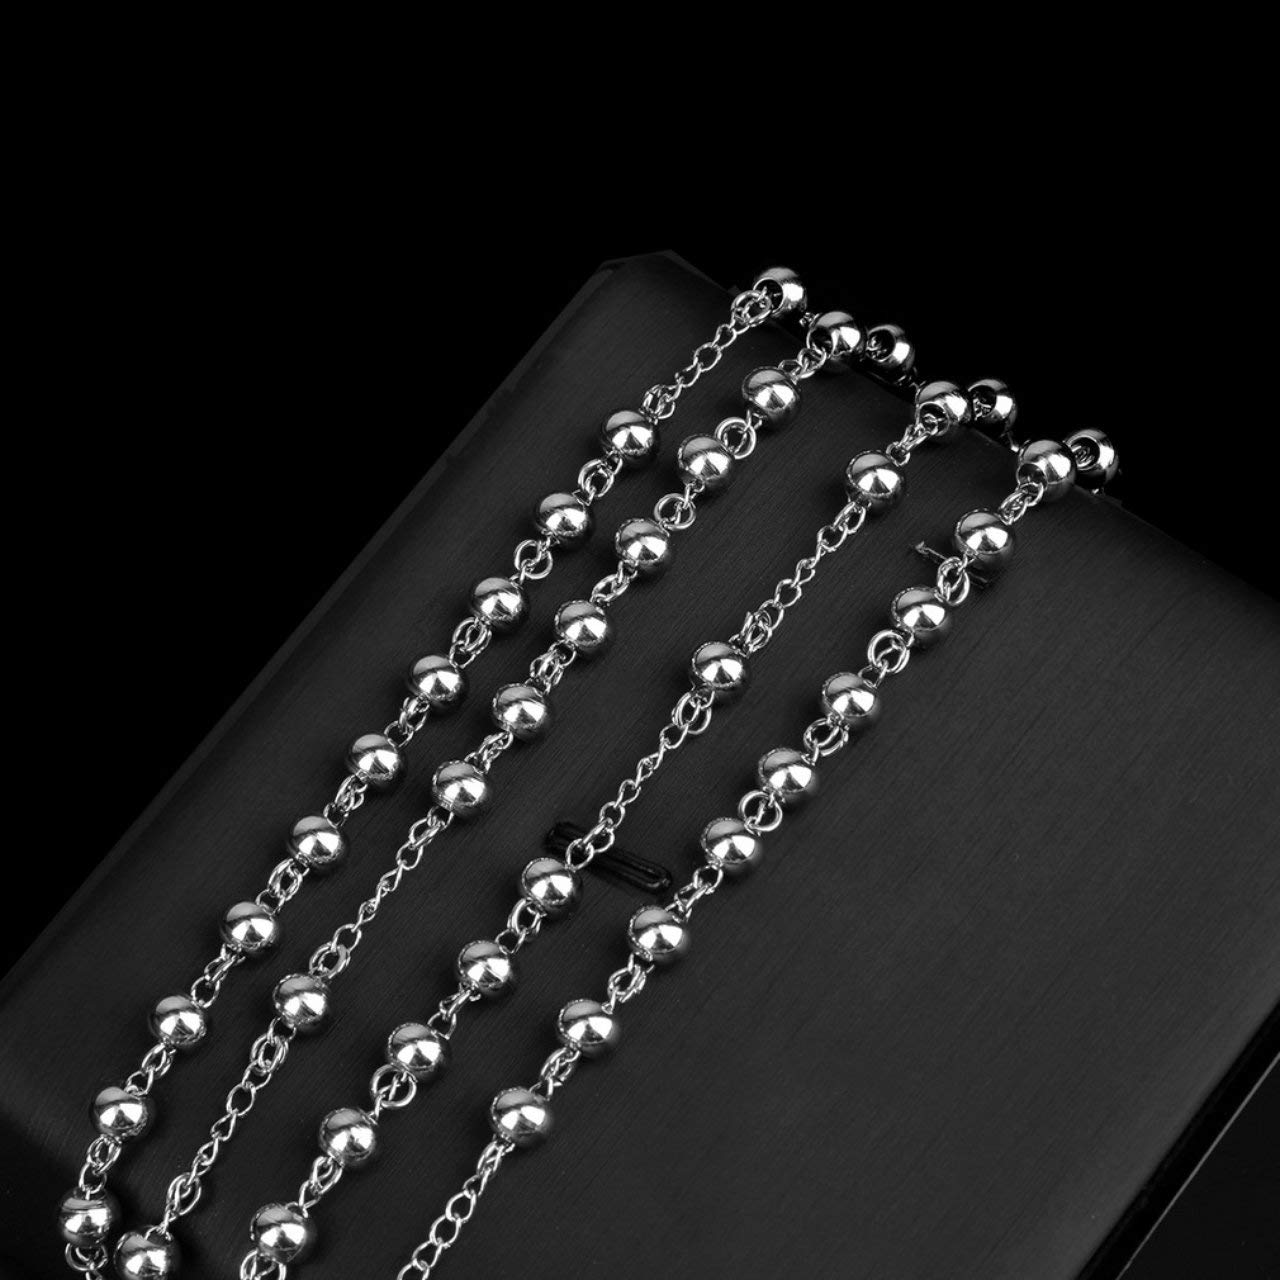 fFRtprintse Breloques Unisex en Acier Inoxydable Argent Chapelet Perles en Acier Inoxydable Collier Pendentif Croix Design de la Mode